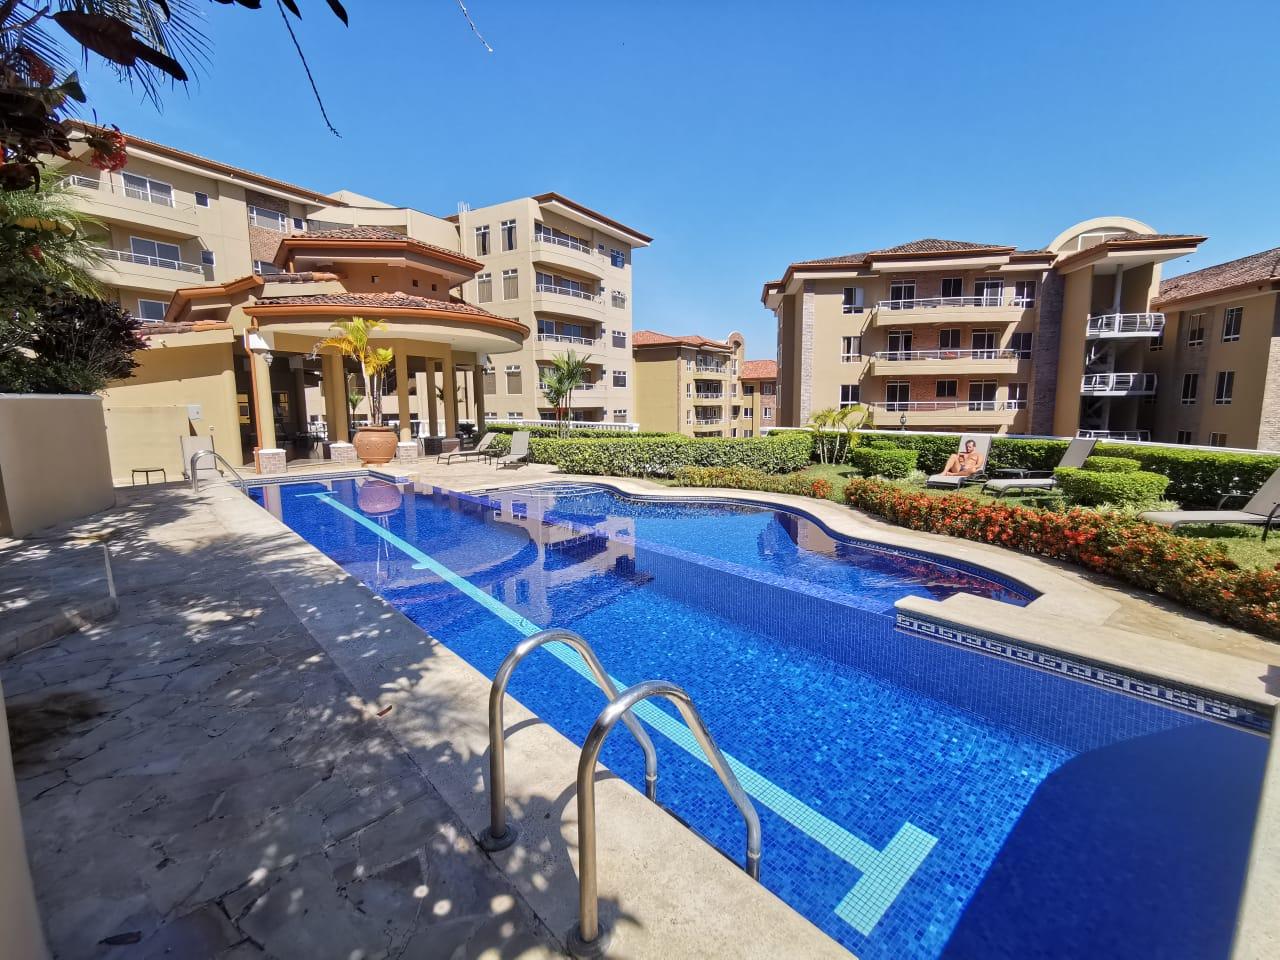 2858 Se Alquila apartamento en San Rafael de Escazú.